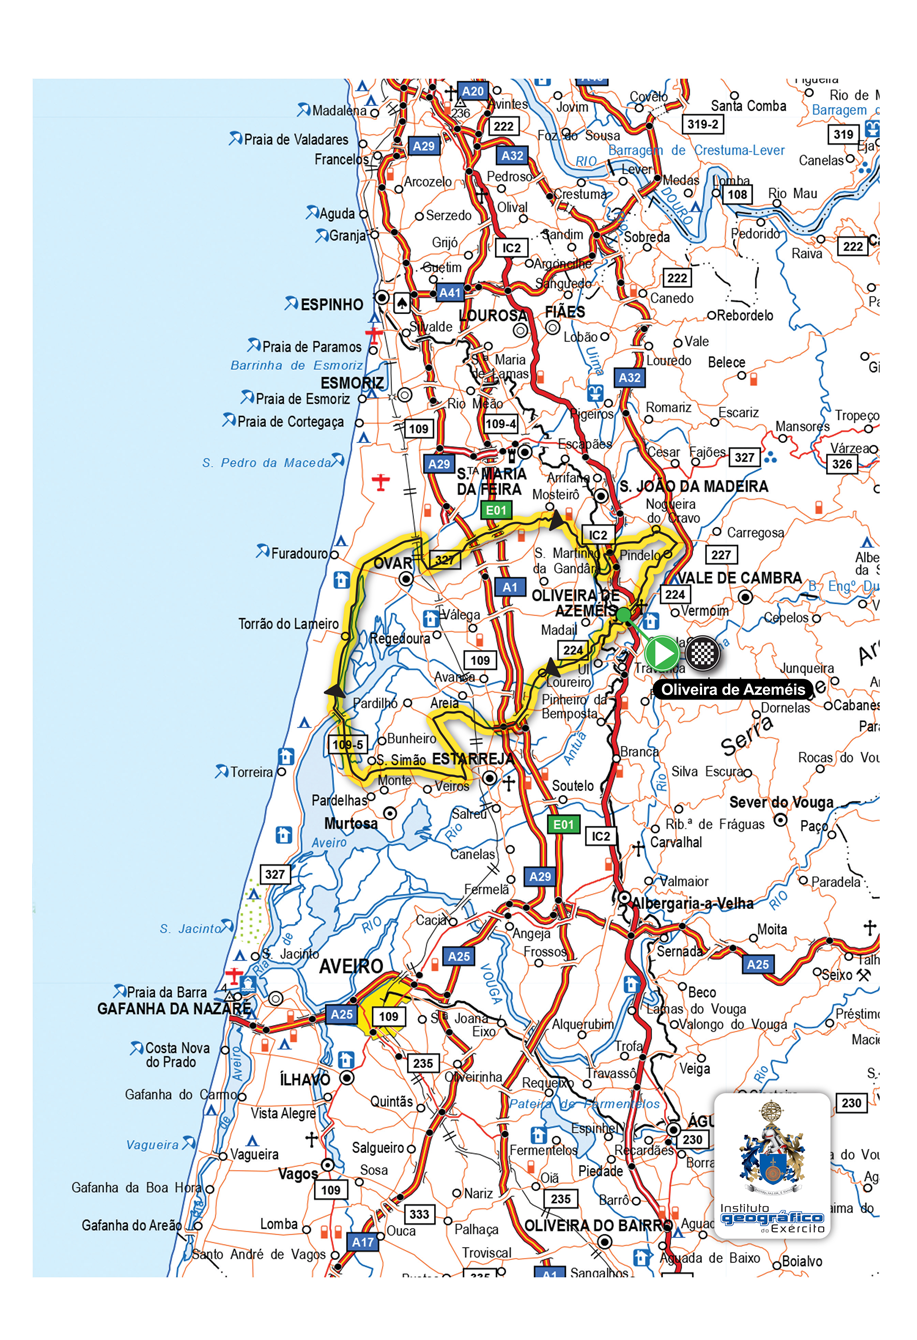 mapa portugal 2015 BTTArouca: Dia 5 de Agosto podes ser o herói da Volta a Portugal  mapa portugal 2015